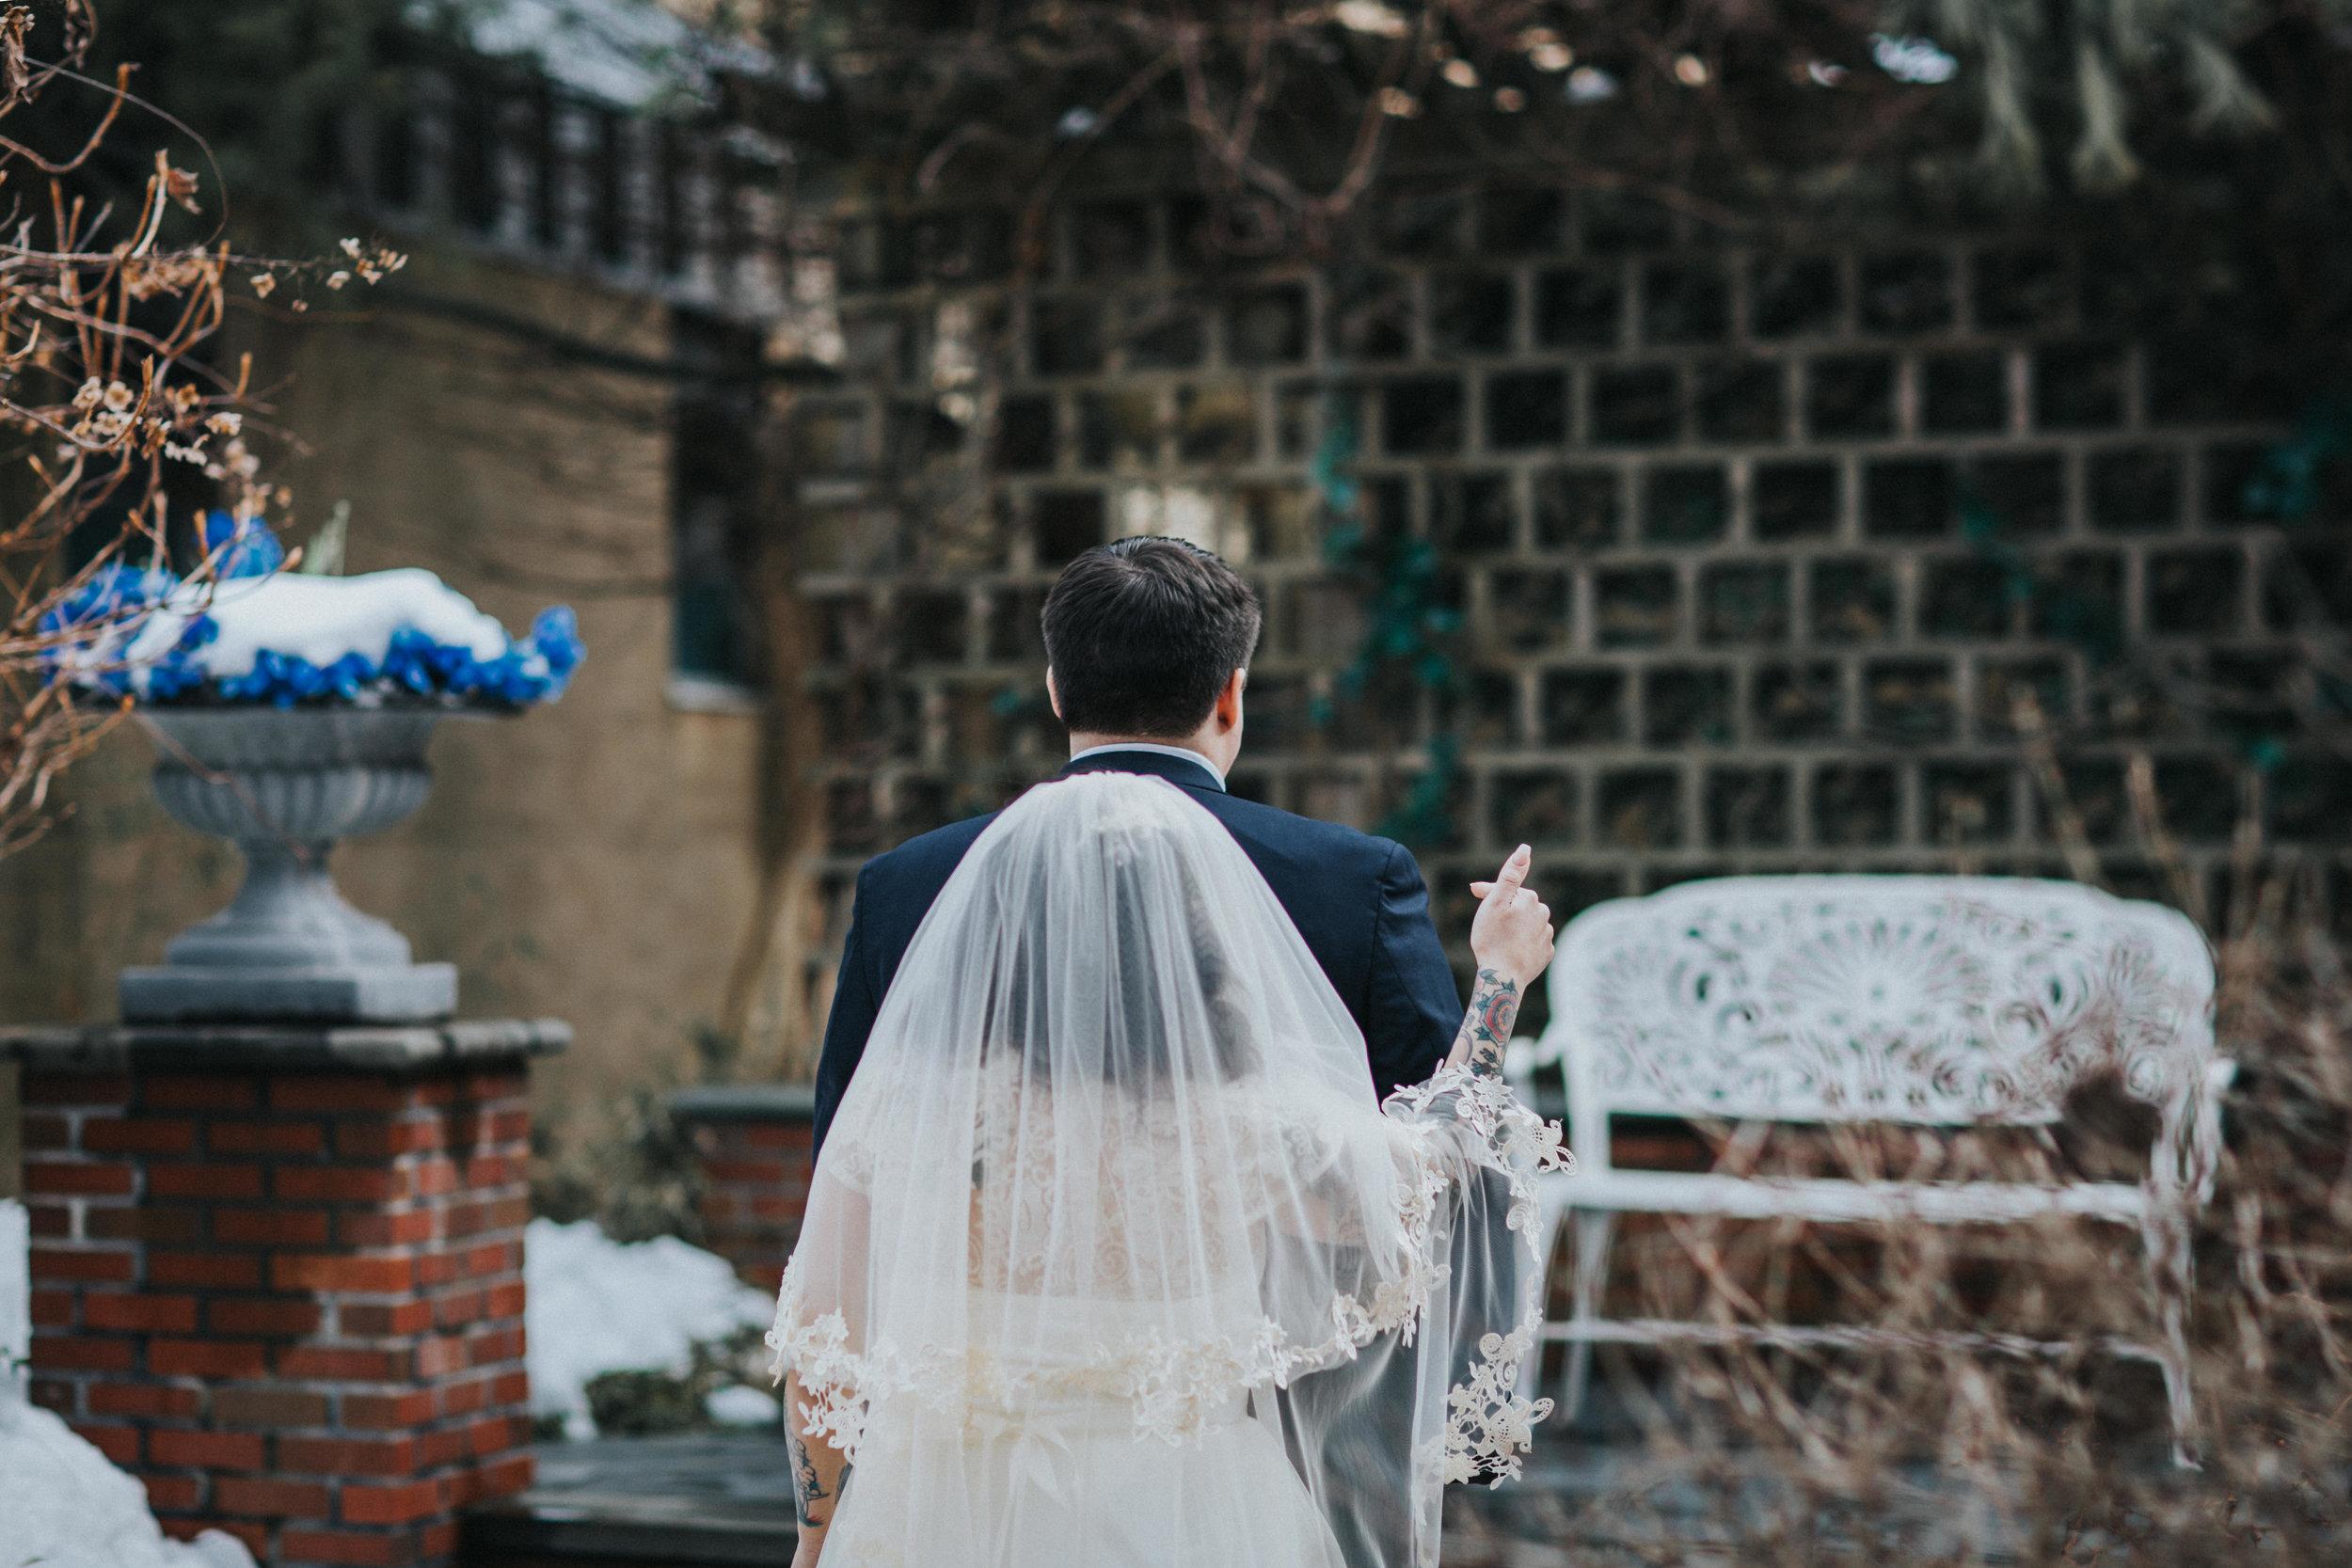 New-Jersey-Wedding-Photographer-ReceptionCenter-Valeria&Mike-First-Look-Bride&Groom (2 of 69).jpg